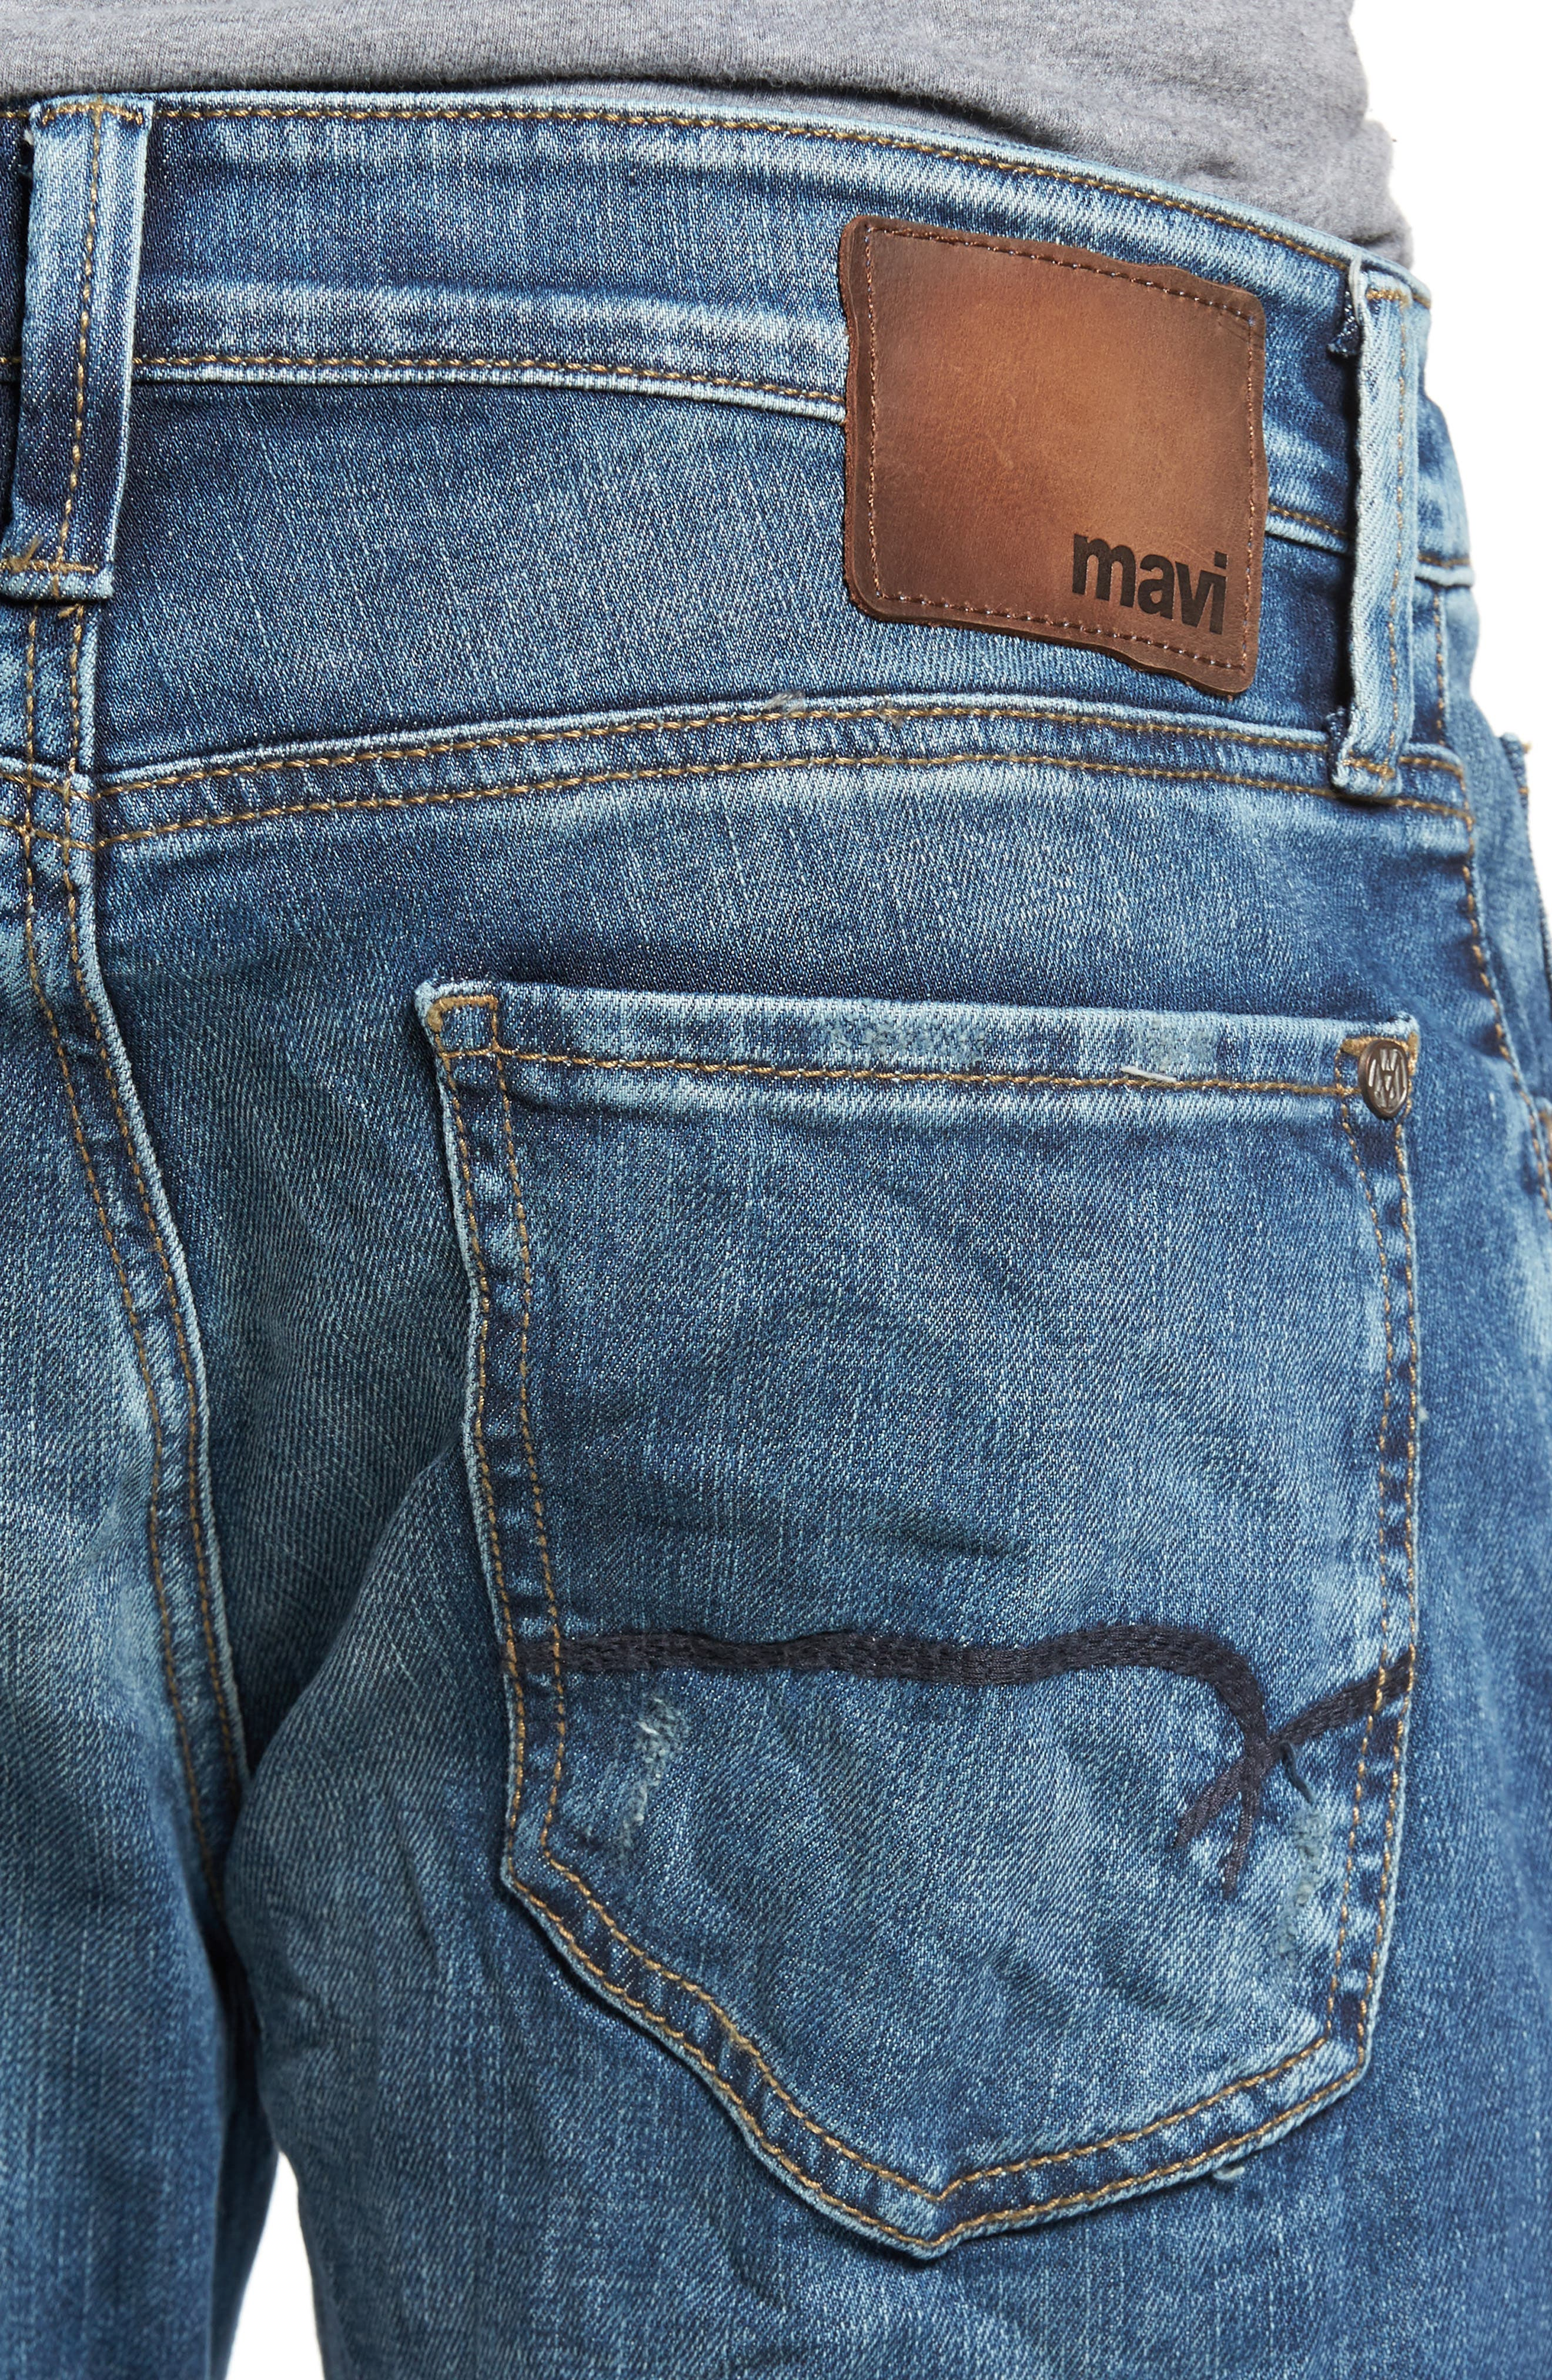 Jake Easy Slim Fit Jeans,                             Alternate thumbnail 4, color,                             420